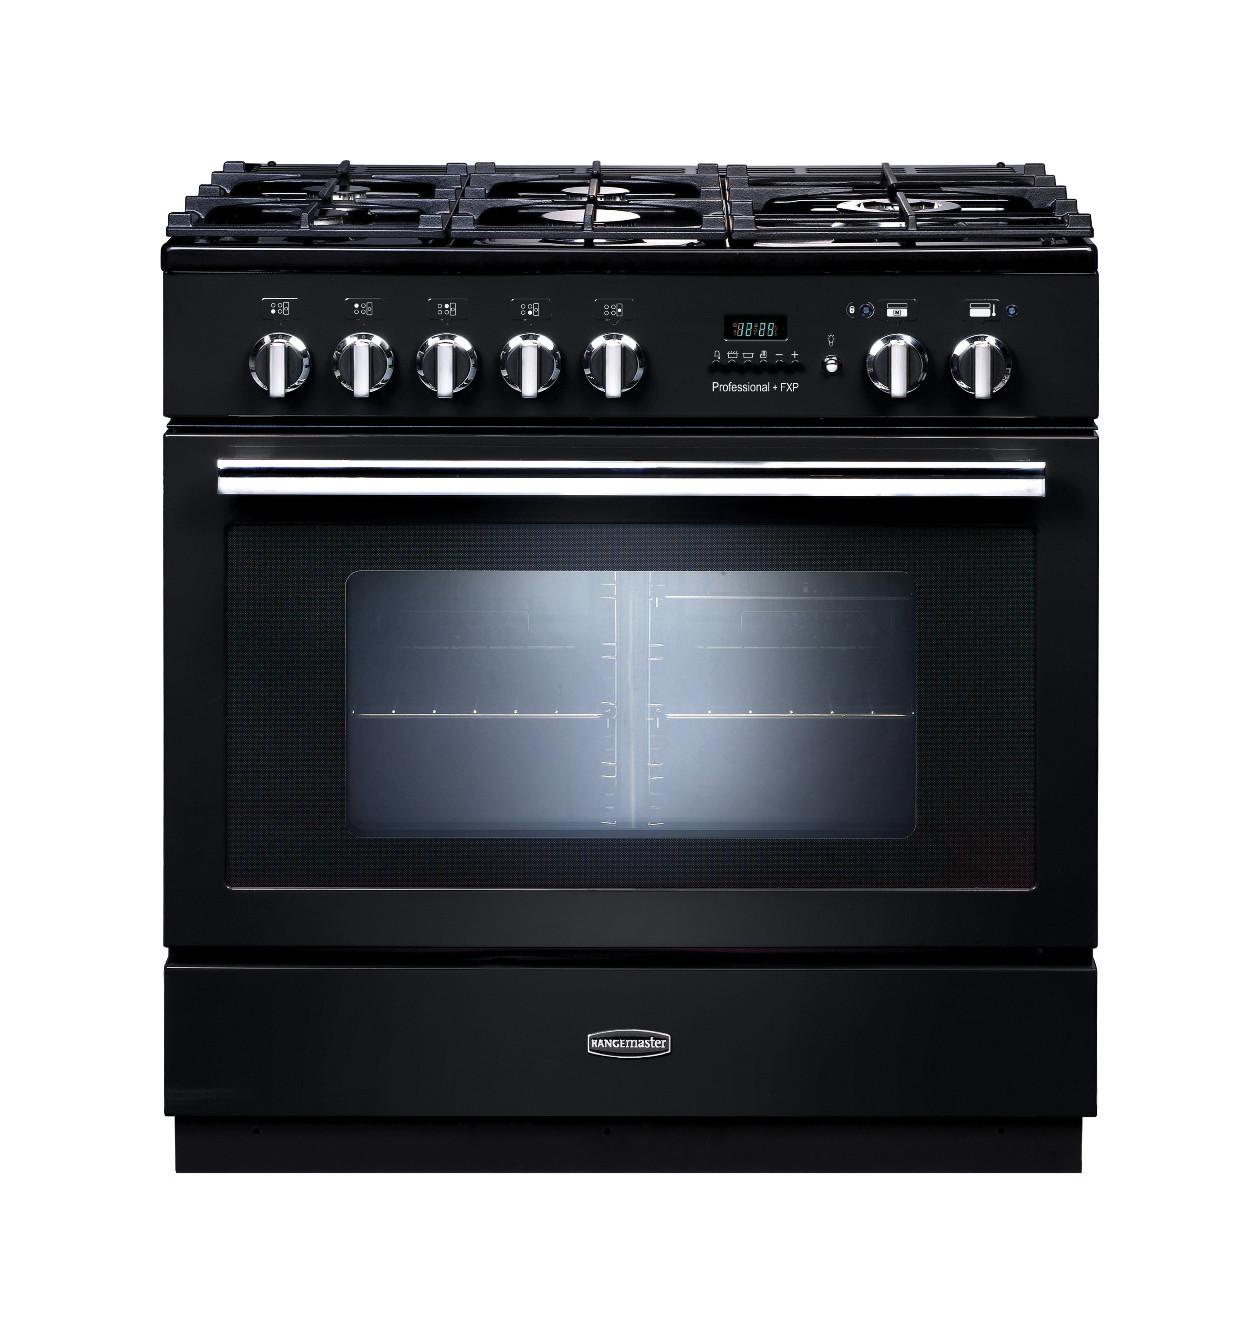 Rangemaster Professional Plus FXP Dual Fuel Black Range Cooker 92730